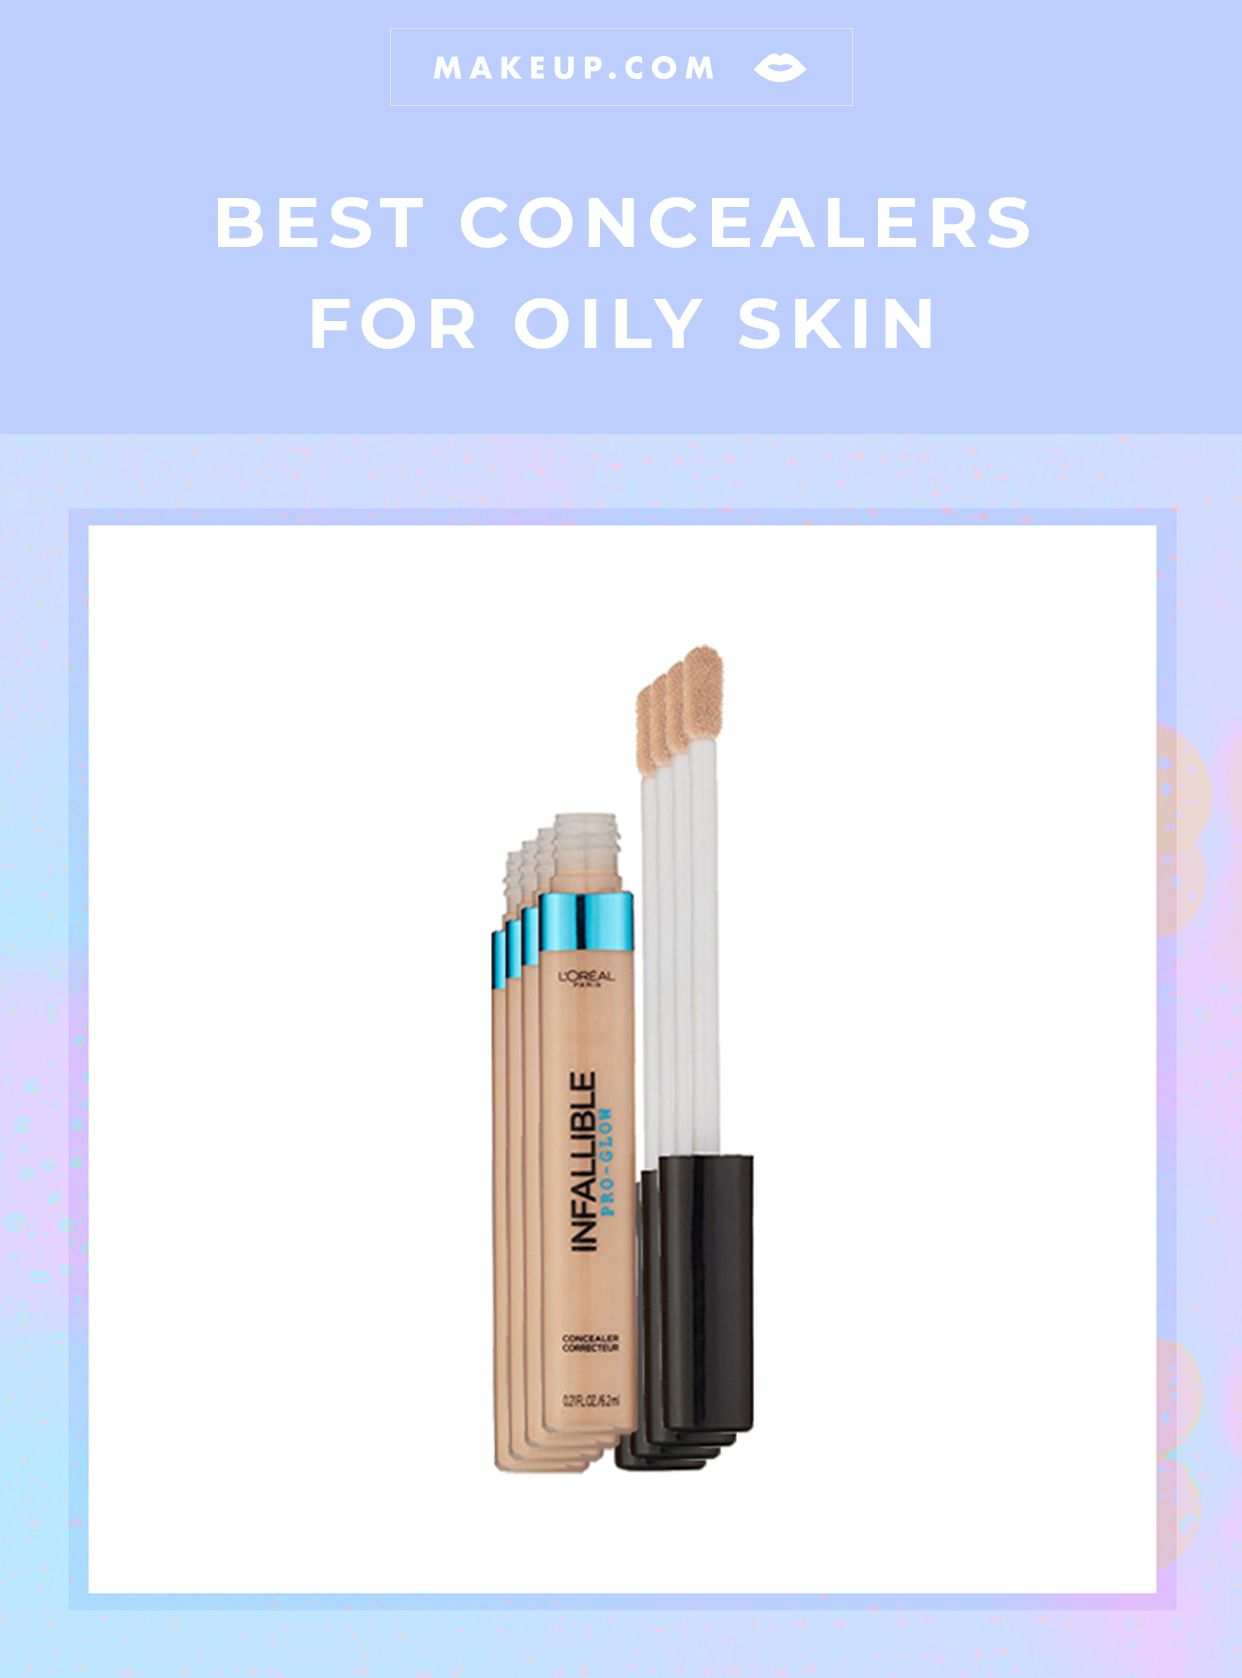 Best Concealers for Oily Skin | Oily skin, Best concealer ...